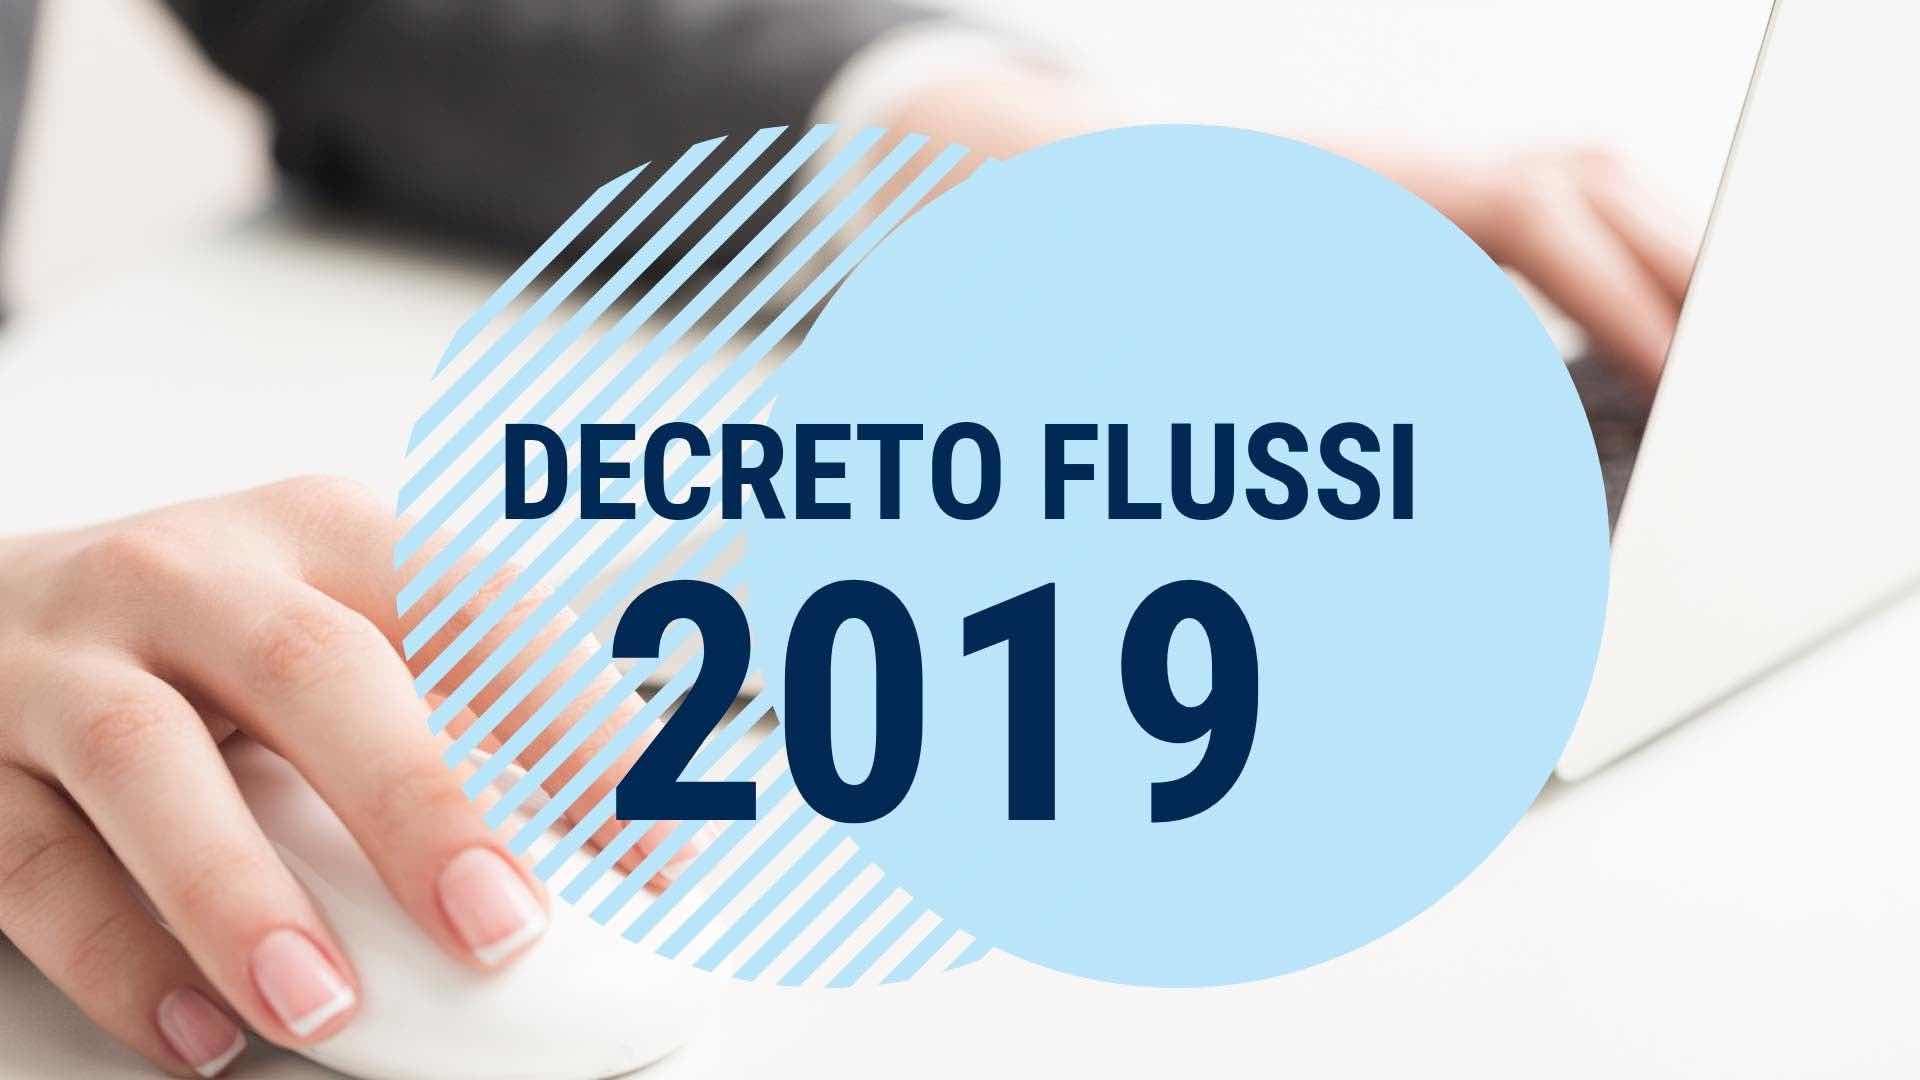 Lavoro. Decreto flussi 2019.